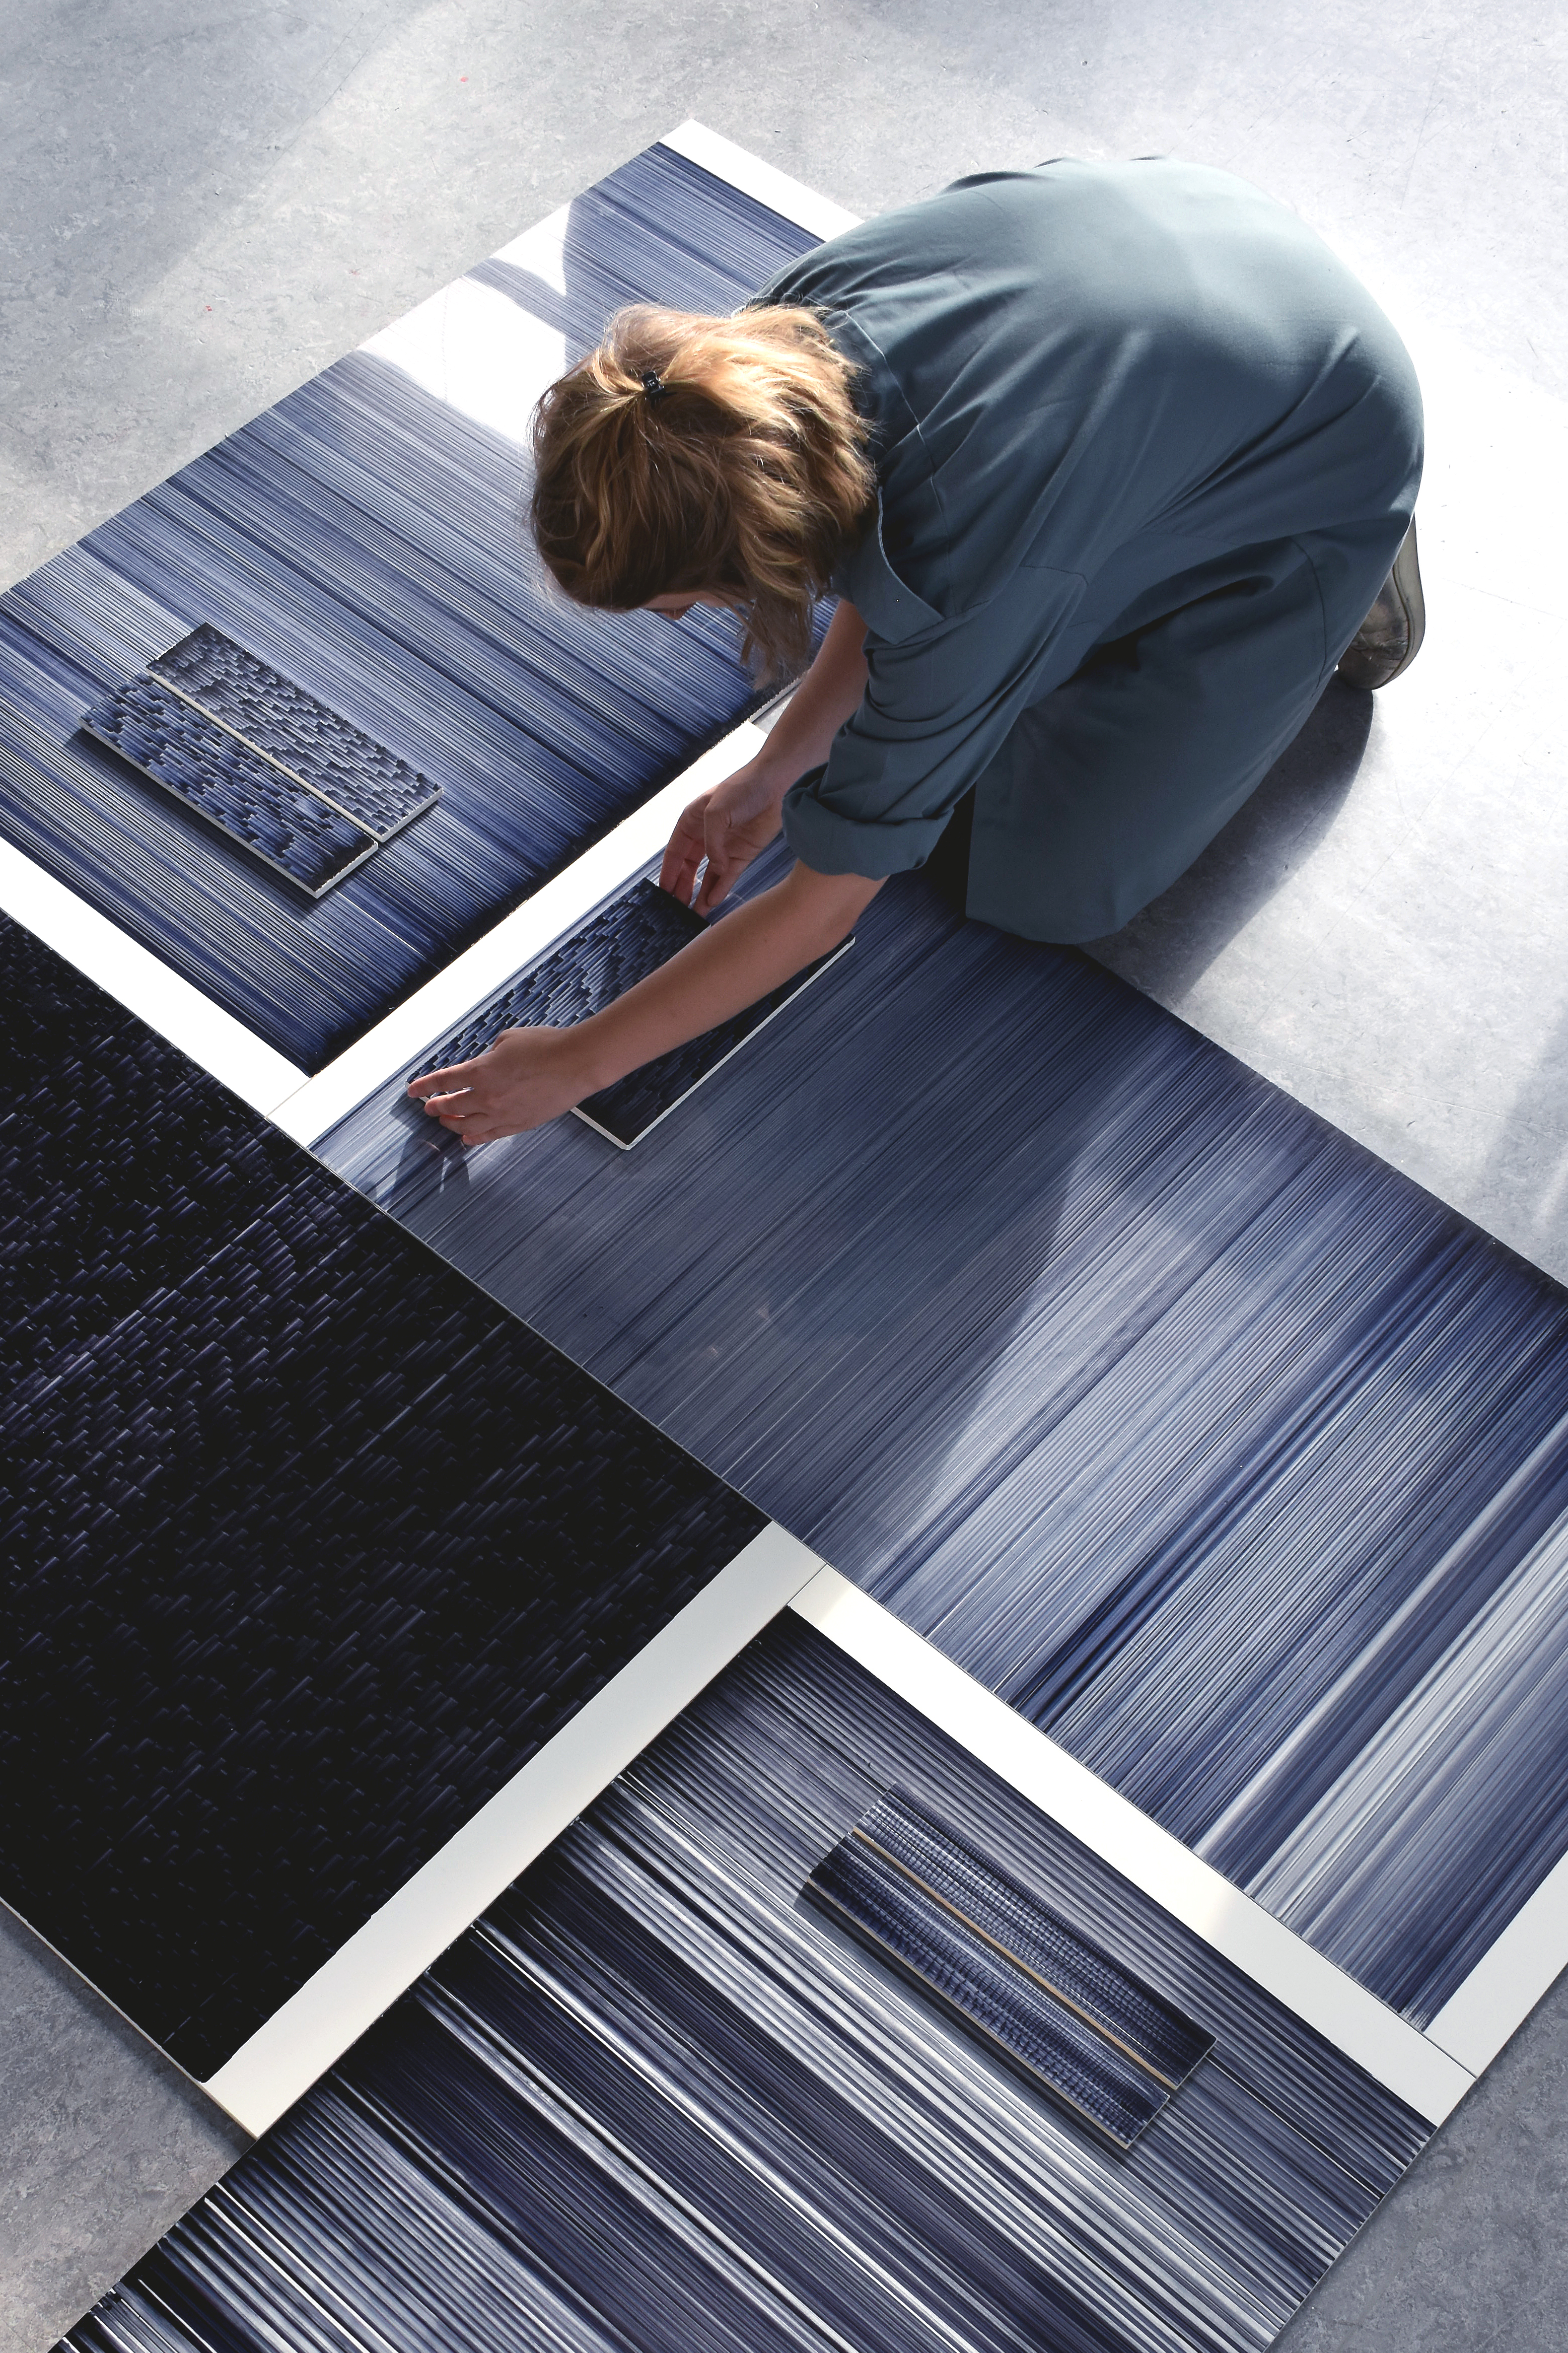 <p>Lea Mazy &#8211; The Production of Fatigue</p>